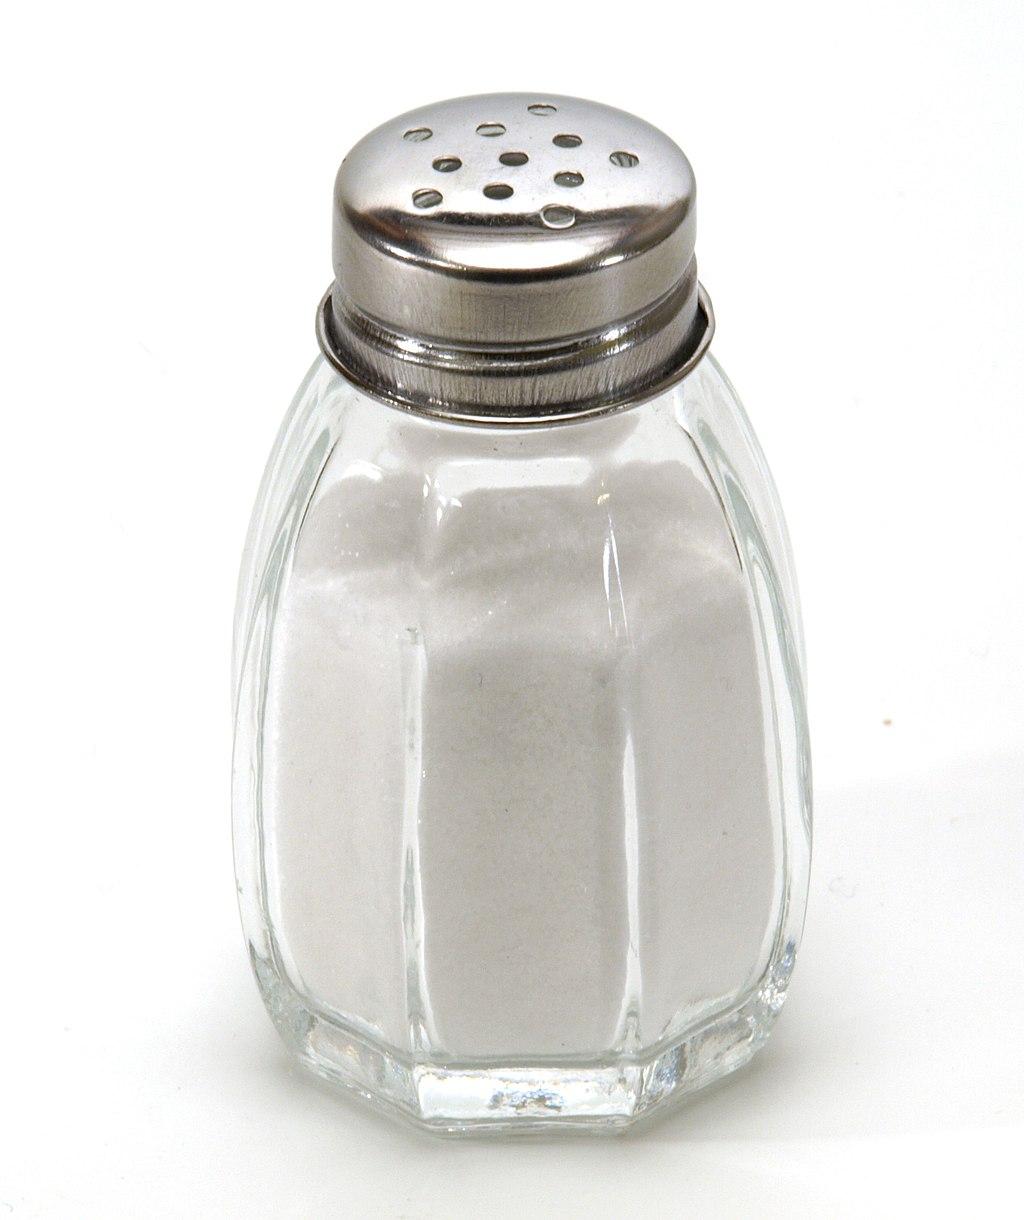 Resultado de imagen de salt